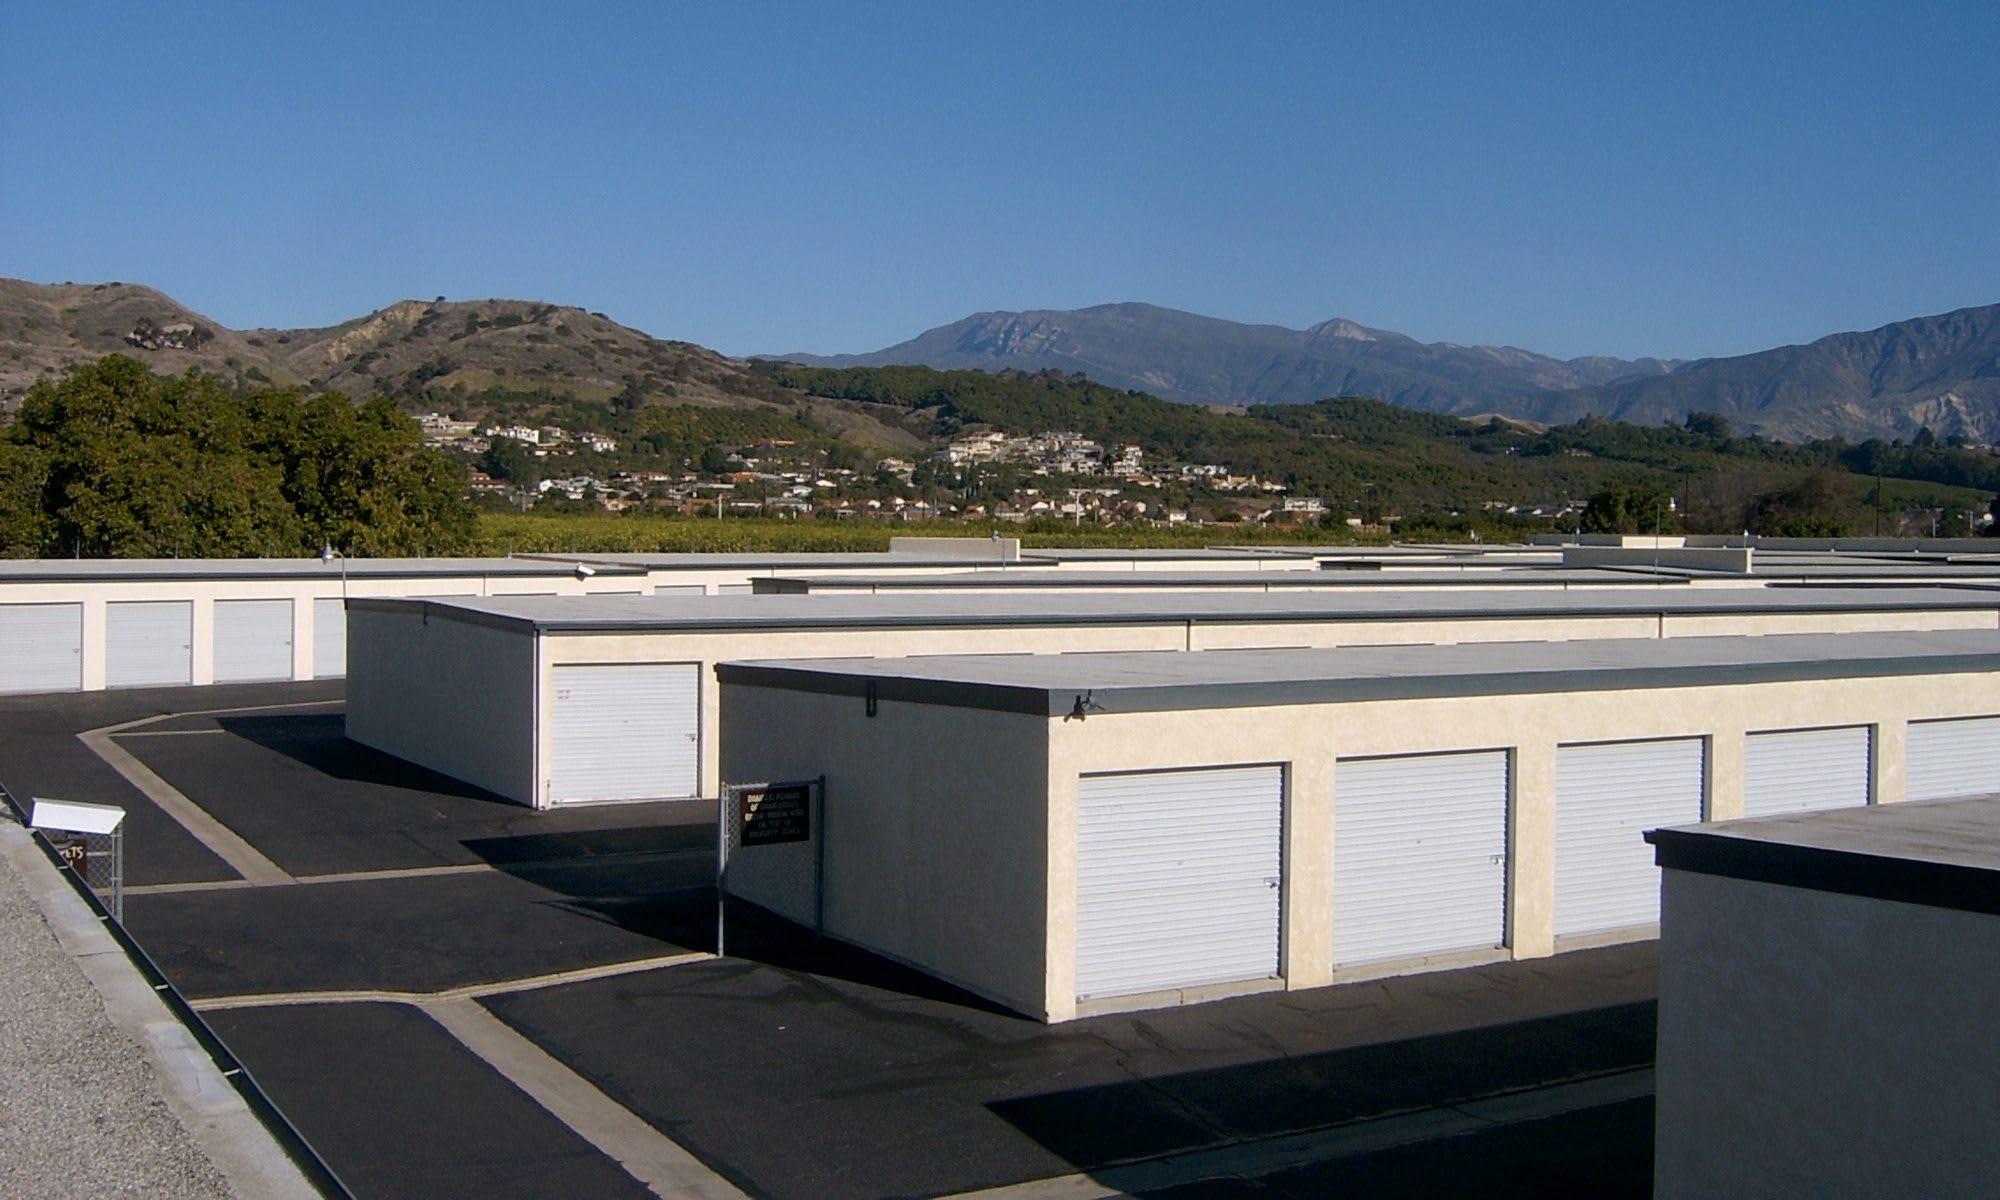 self storage units at The Santa Paula Storage Place